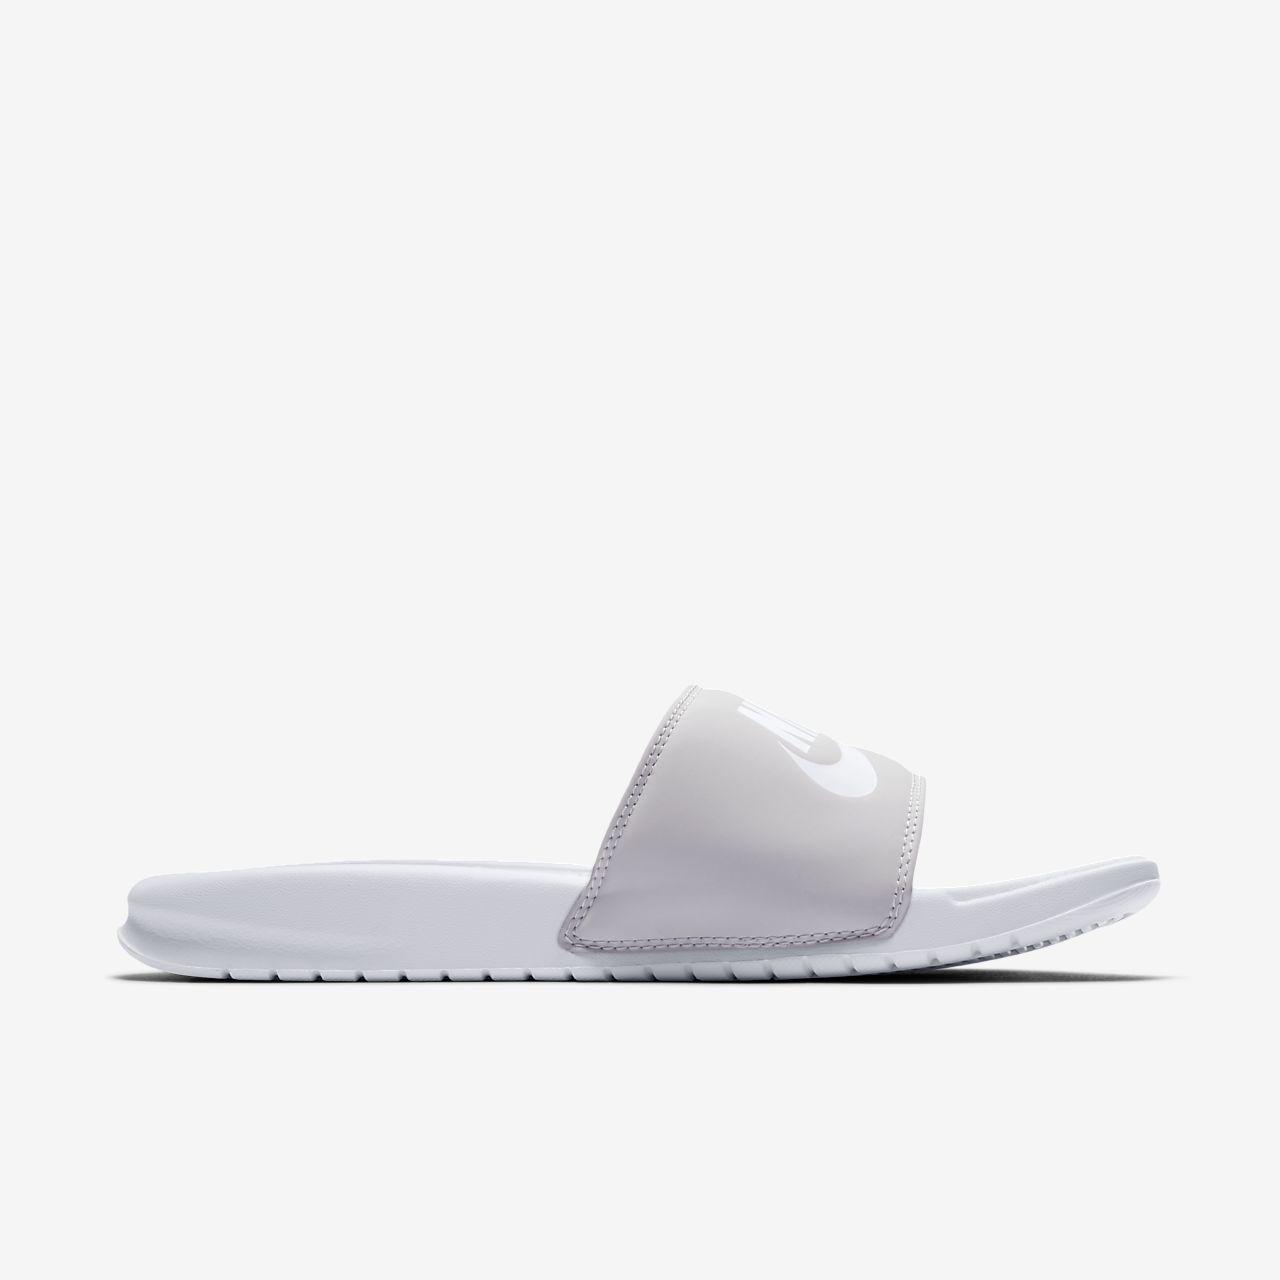 8c7d4a39a Nike Benassi Pastel QS Women s Slide. Nike.com SA